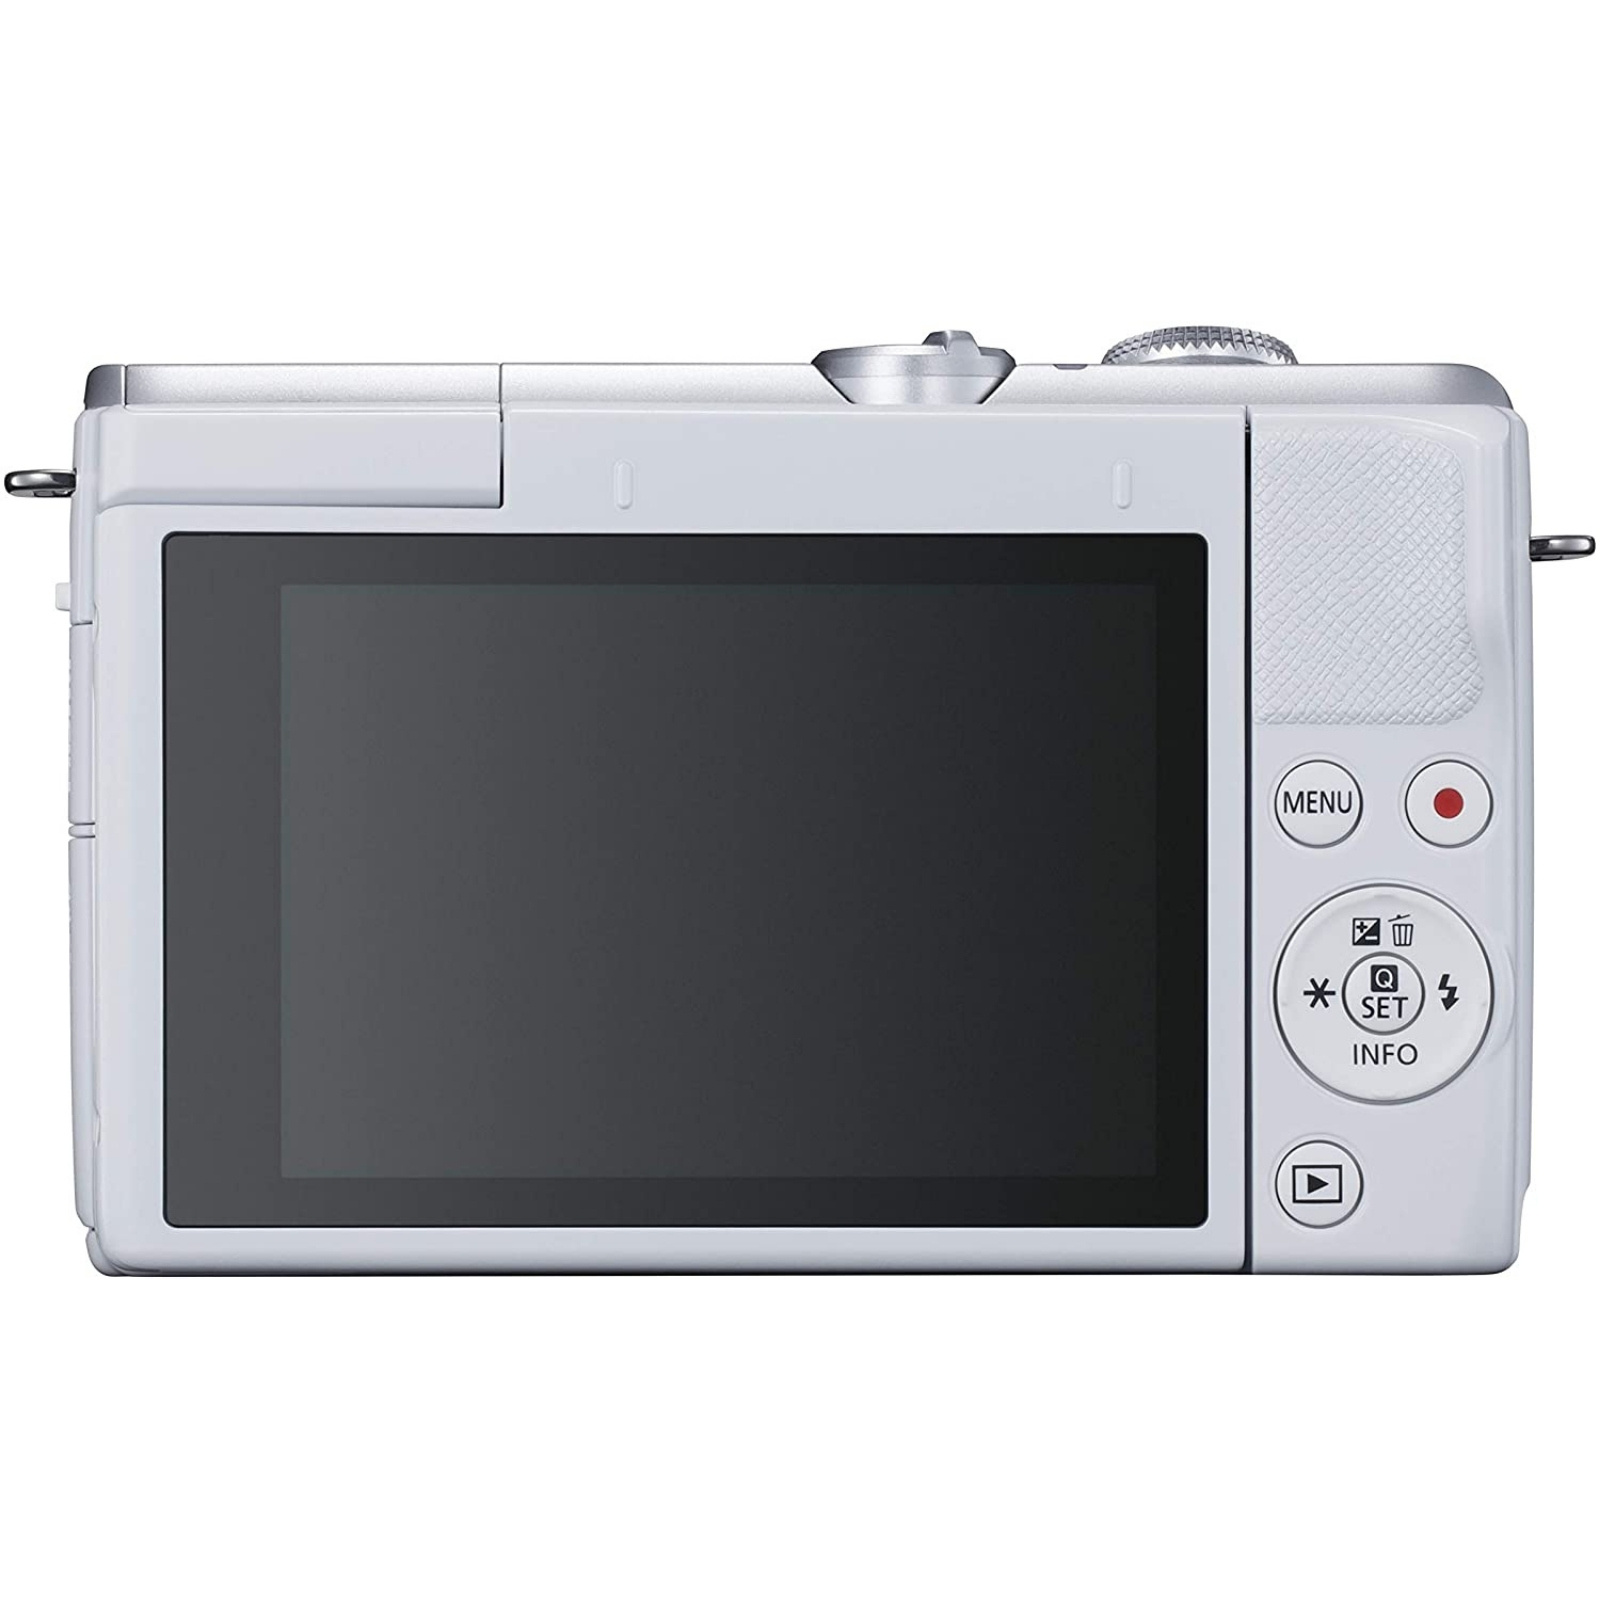 Canon キヤノン ミラーレス一眼カメラ EOS M200 ボディ ホワイト 新品